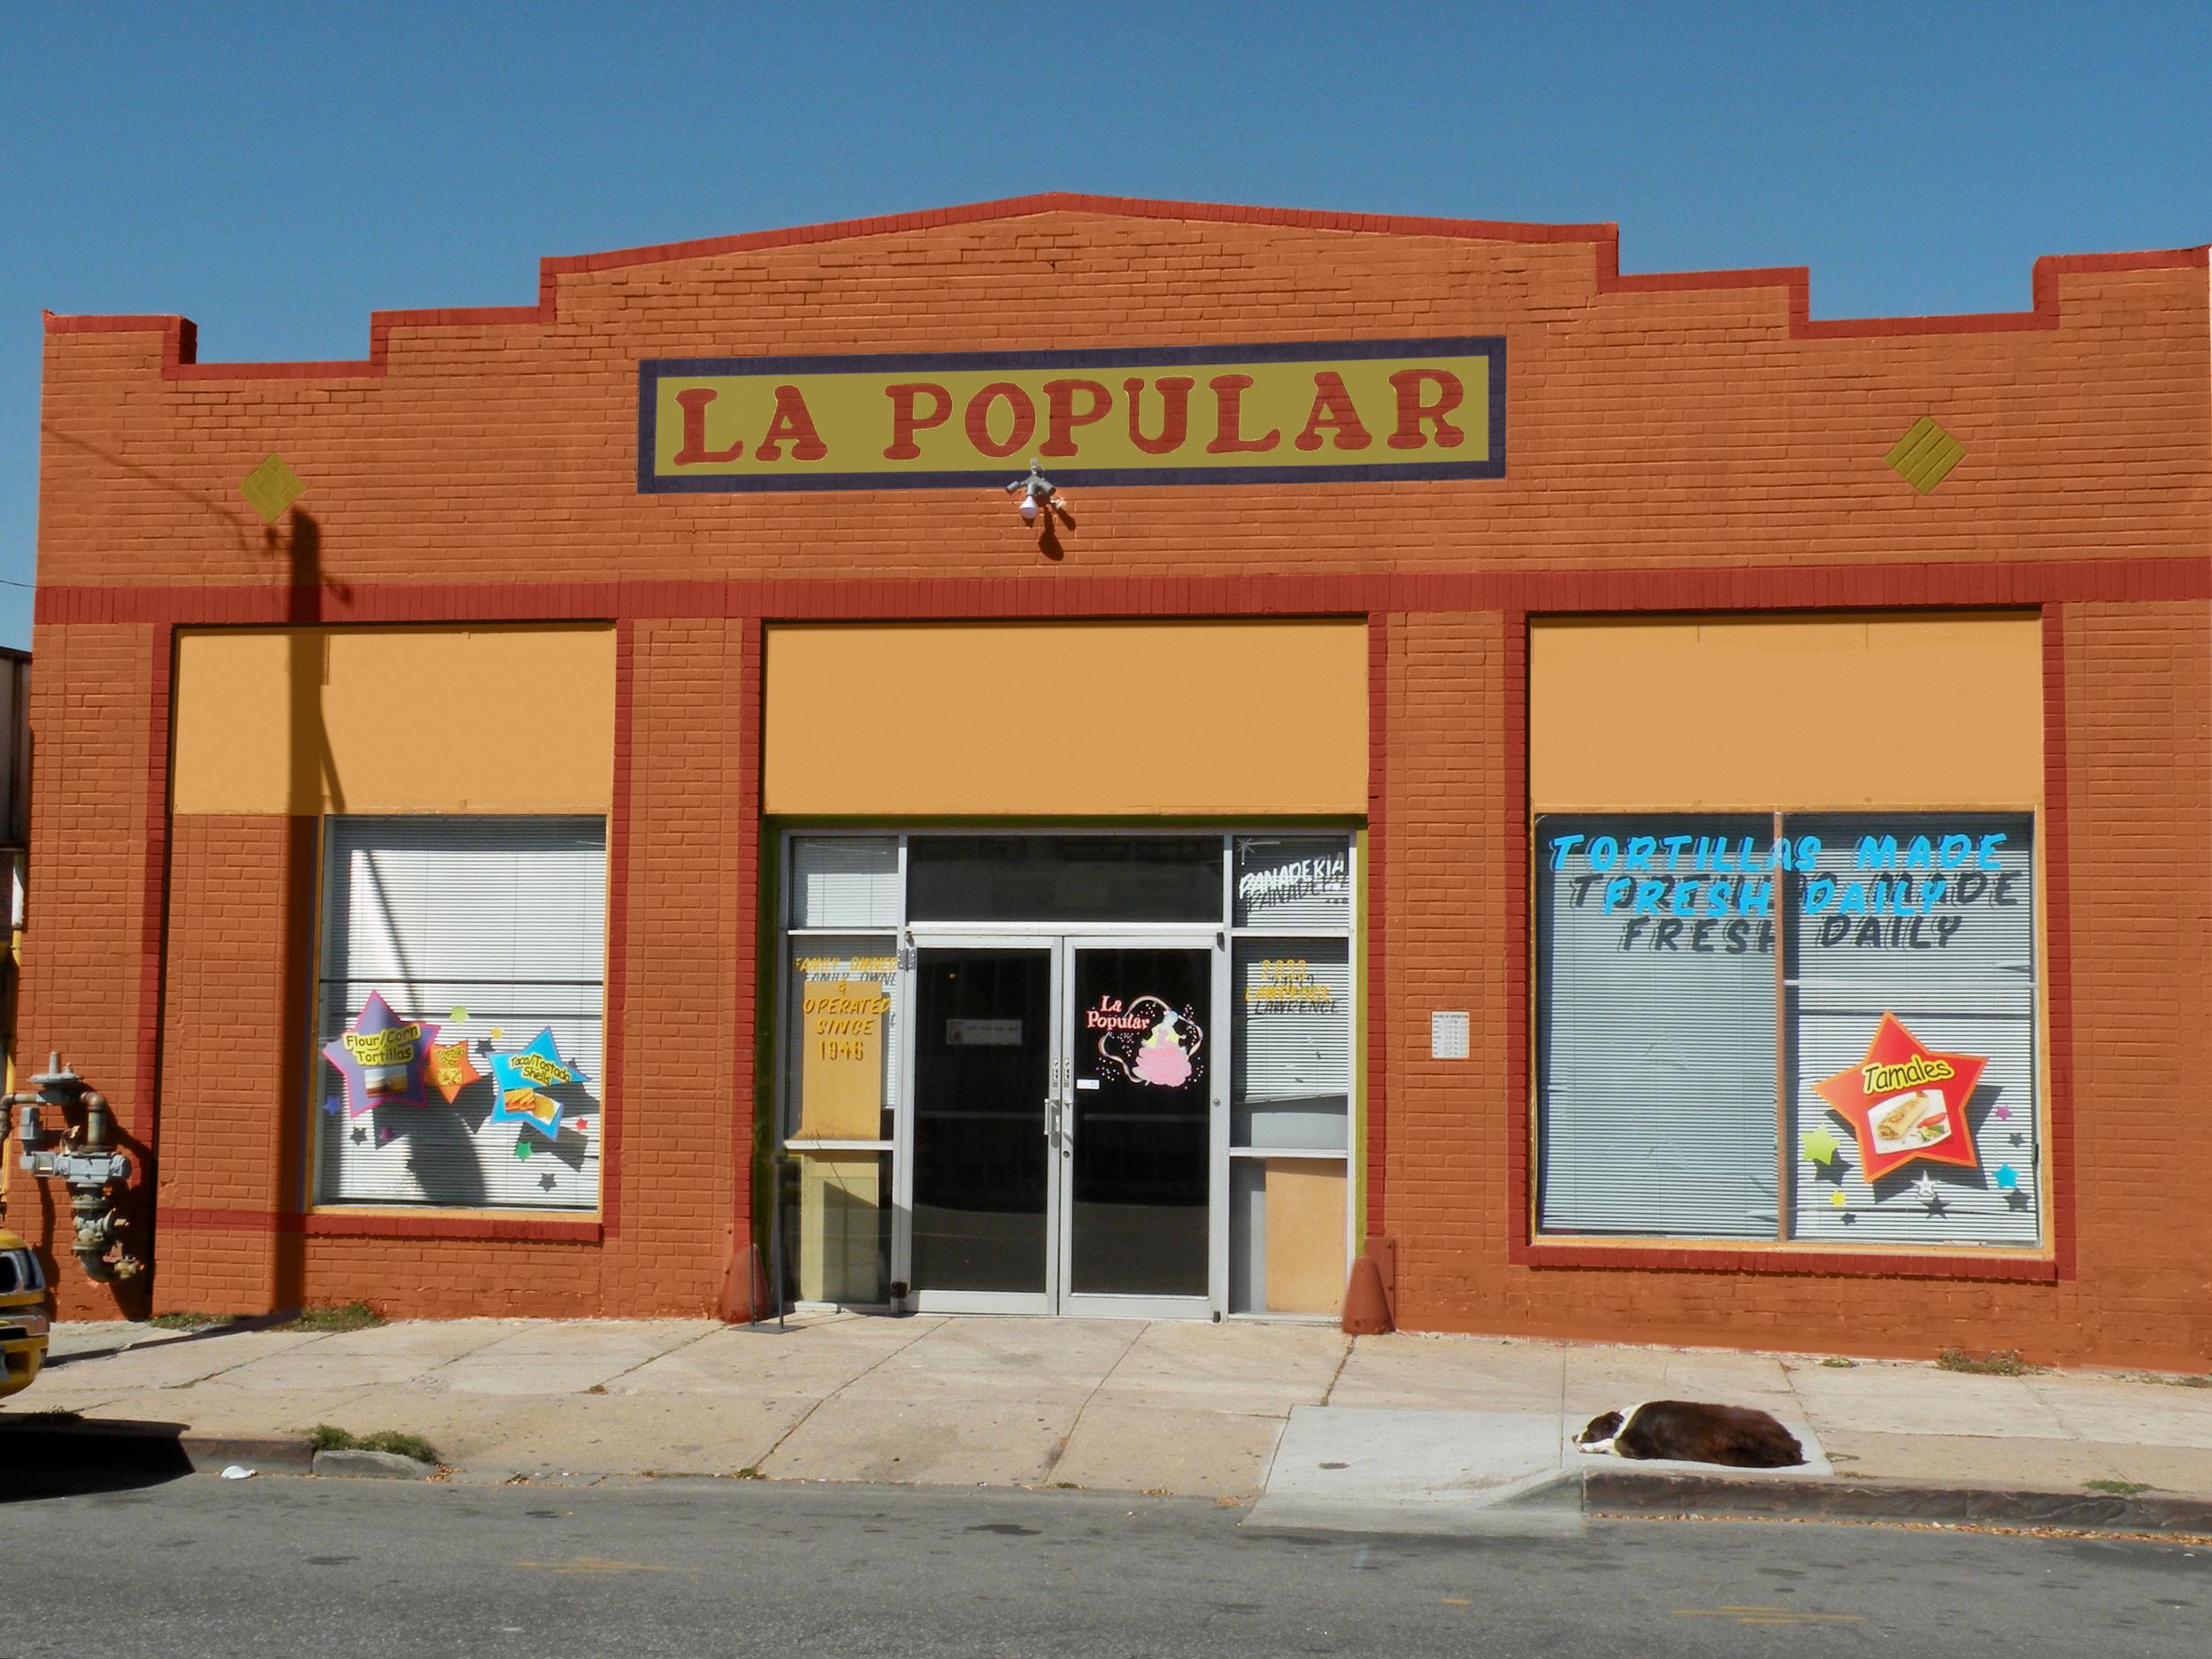 La Popular-restaurant-colors.jpg